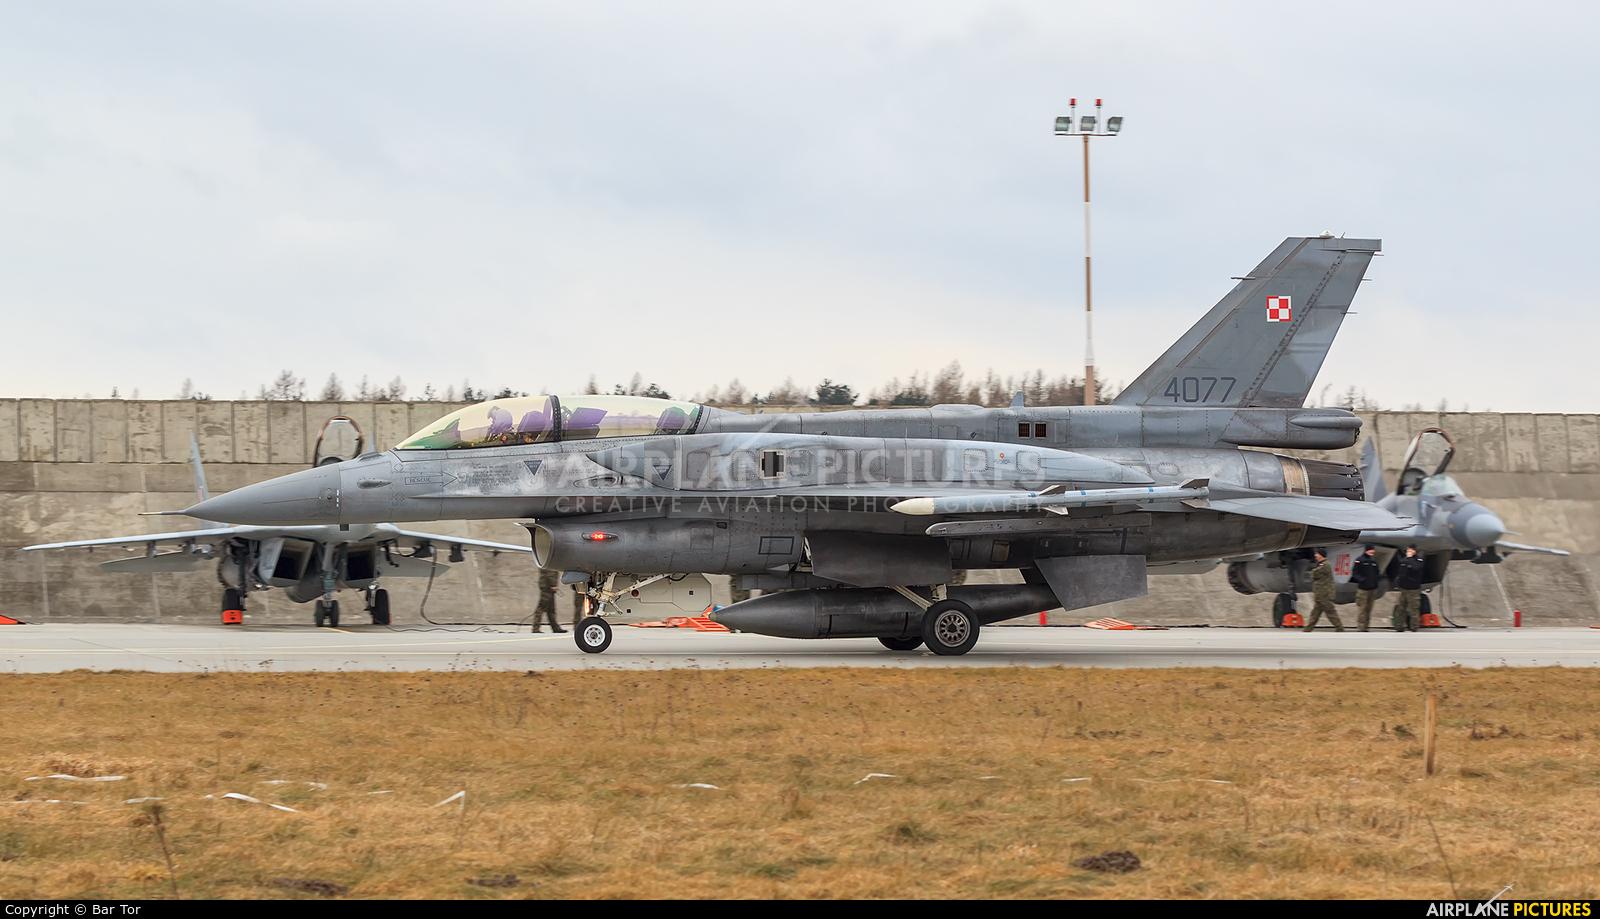 Poland - Air Force 4077 aircraft at Poznań - Krzesiny